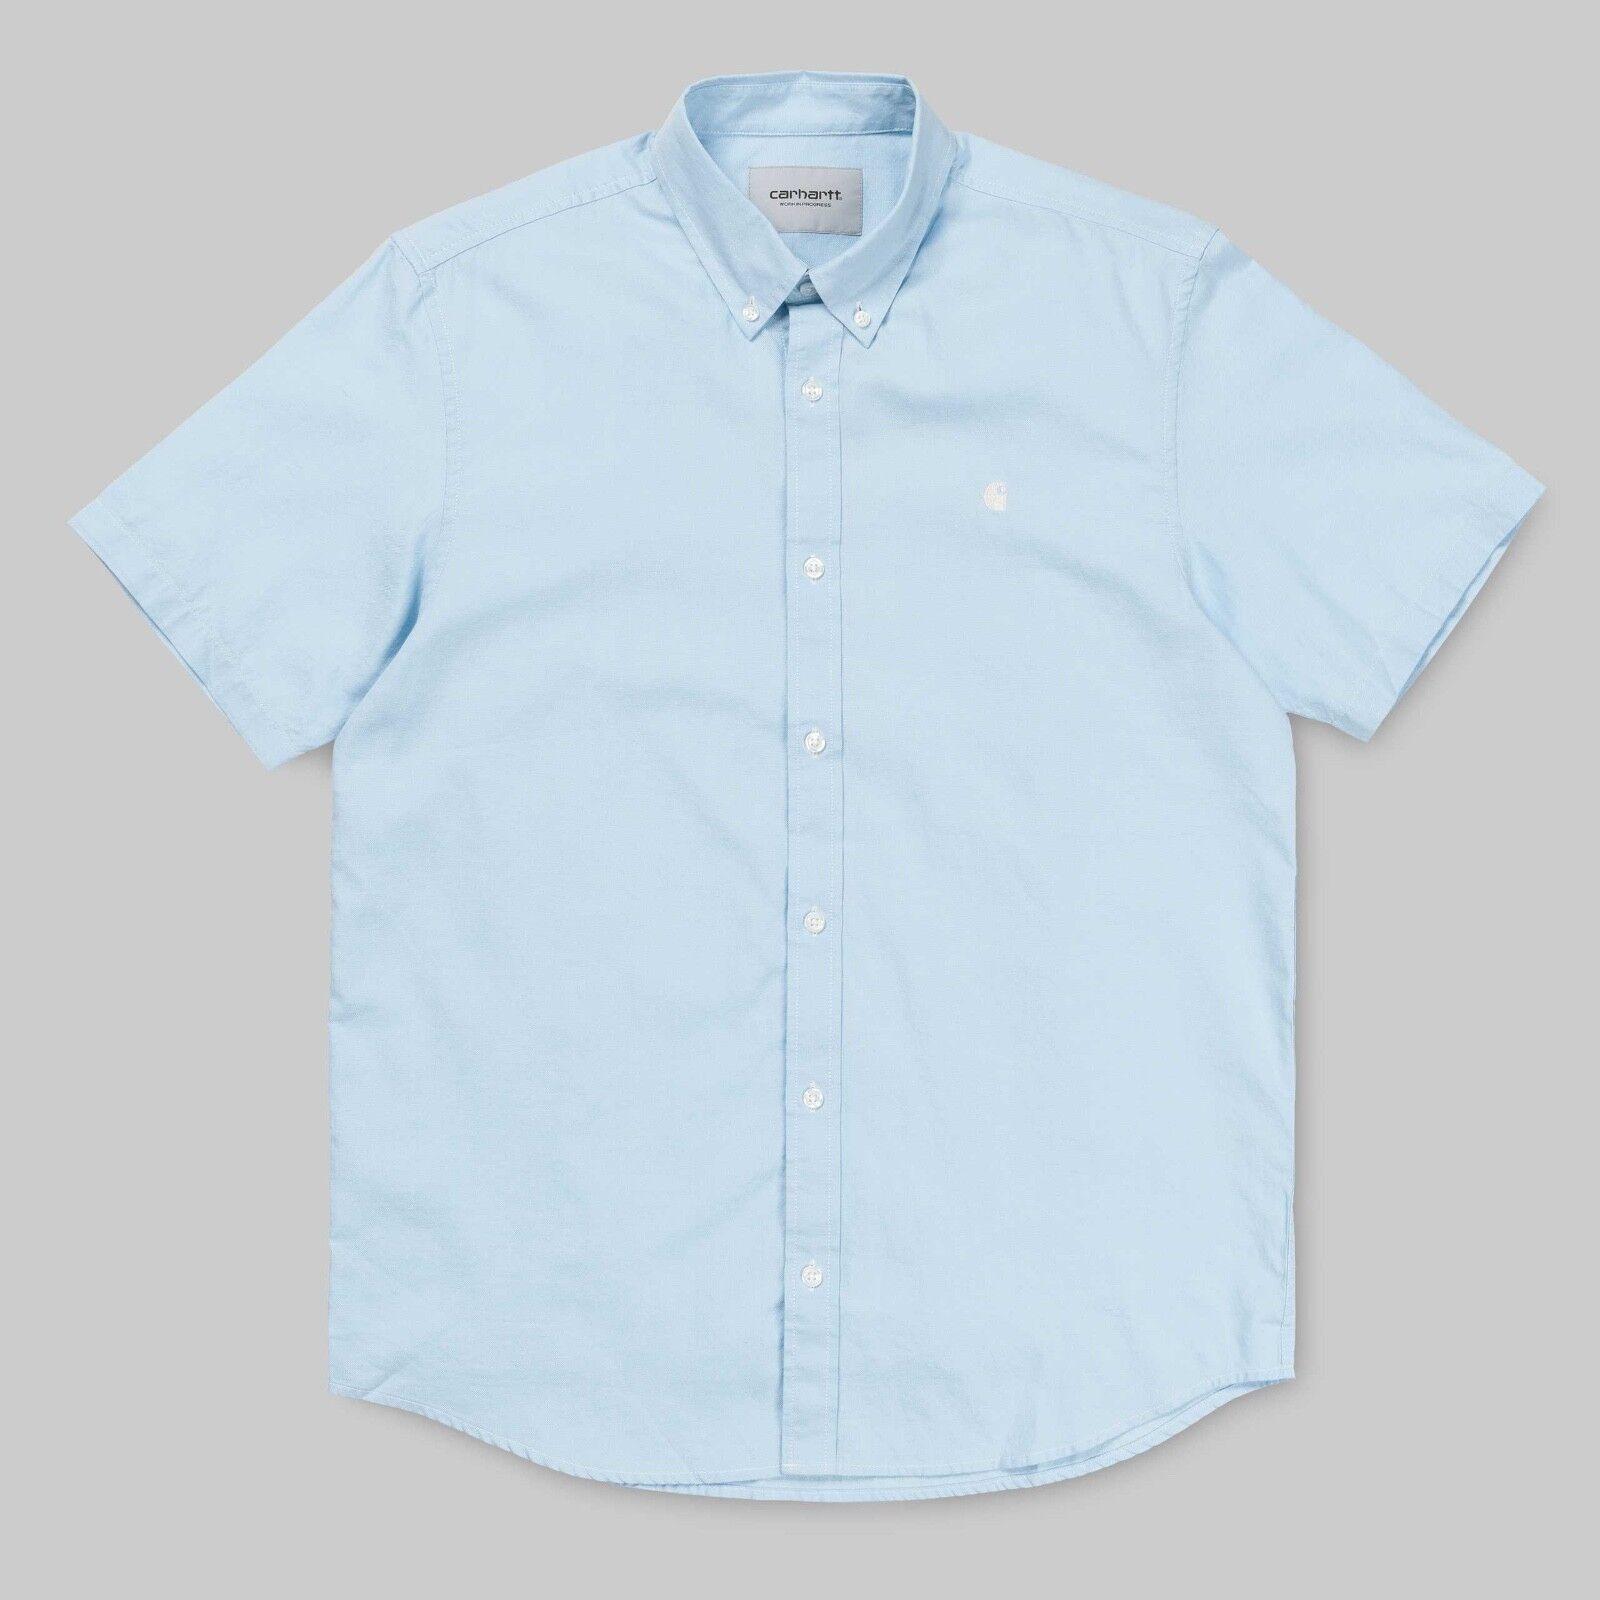 5f966b038 Carhartt WIP S S Lancaster Logo Shirt Shirt Shirt Camicia manica corta uomo  Azzurra button 773280